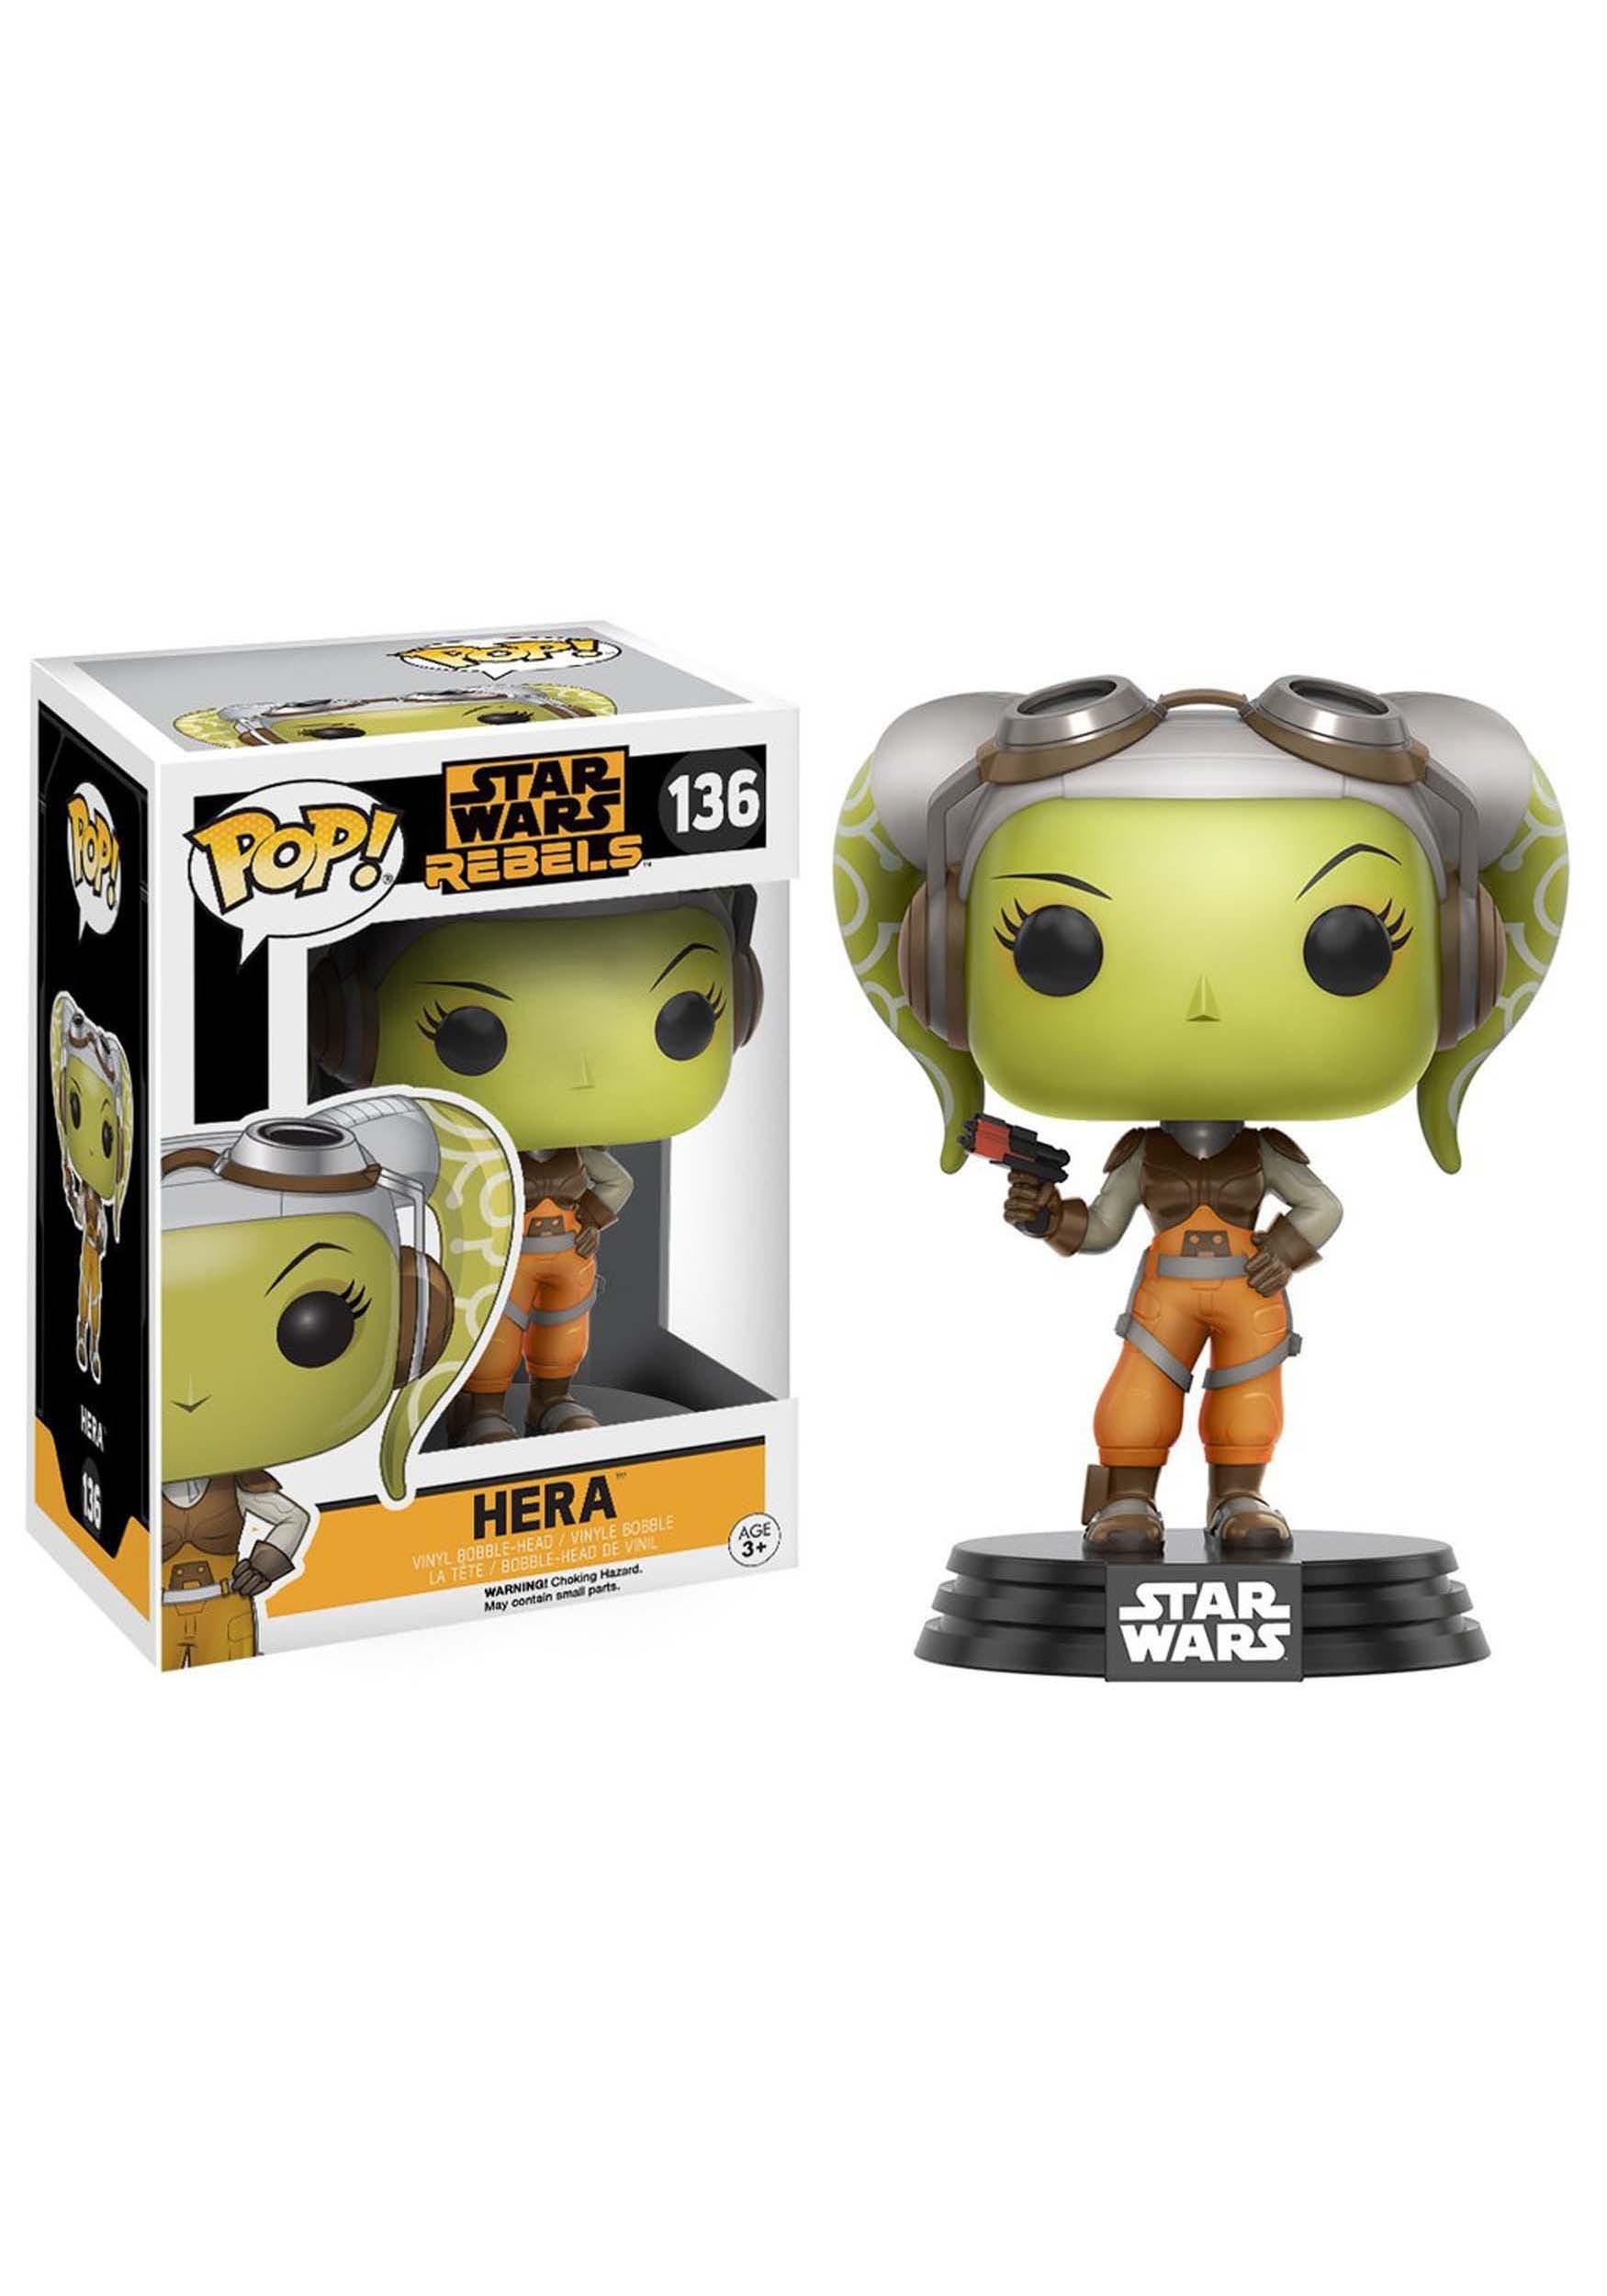 Star Wars: Rebels - Hera Bobblehead POP Figure FN10774